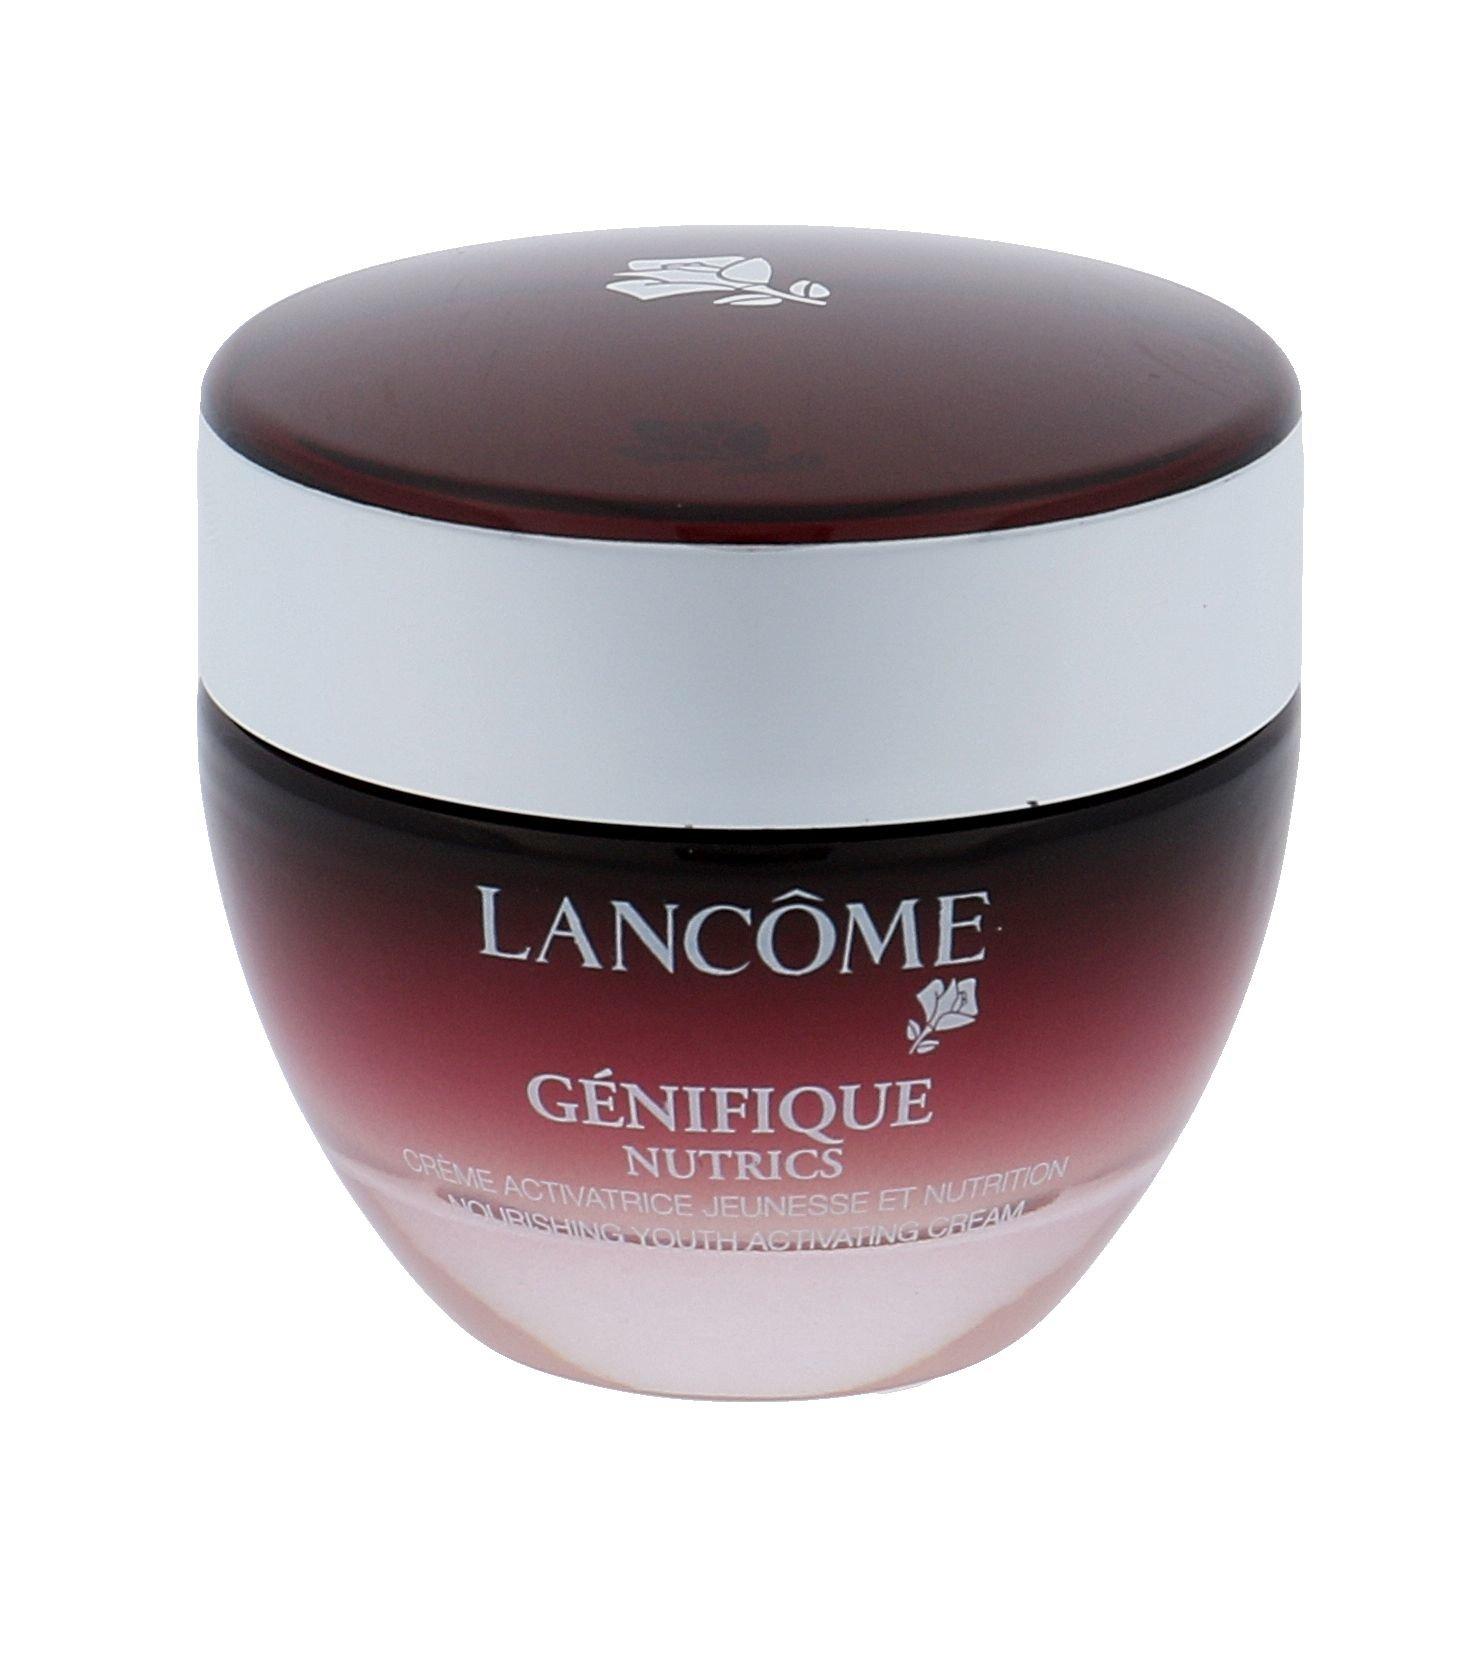 Lancôme Genifique Nutrics Cosmetic 50ml